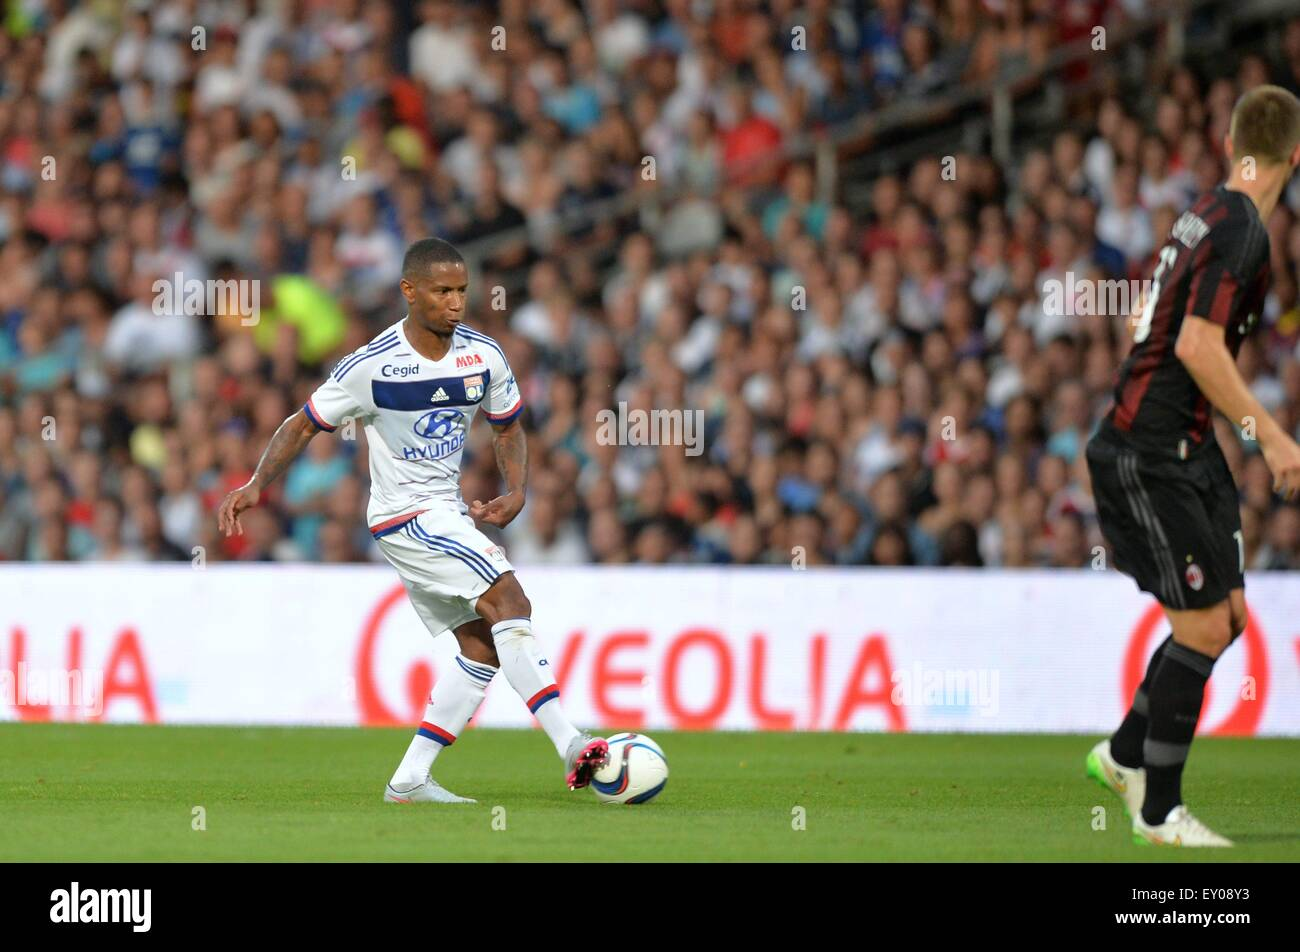 18.07.2015. stade de gerland, Lyon, France, Preseason football friendly, Lyon versus AC Milan. Claudio Beauvue (ol) Stock Photo